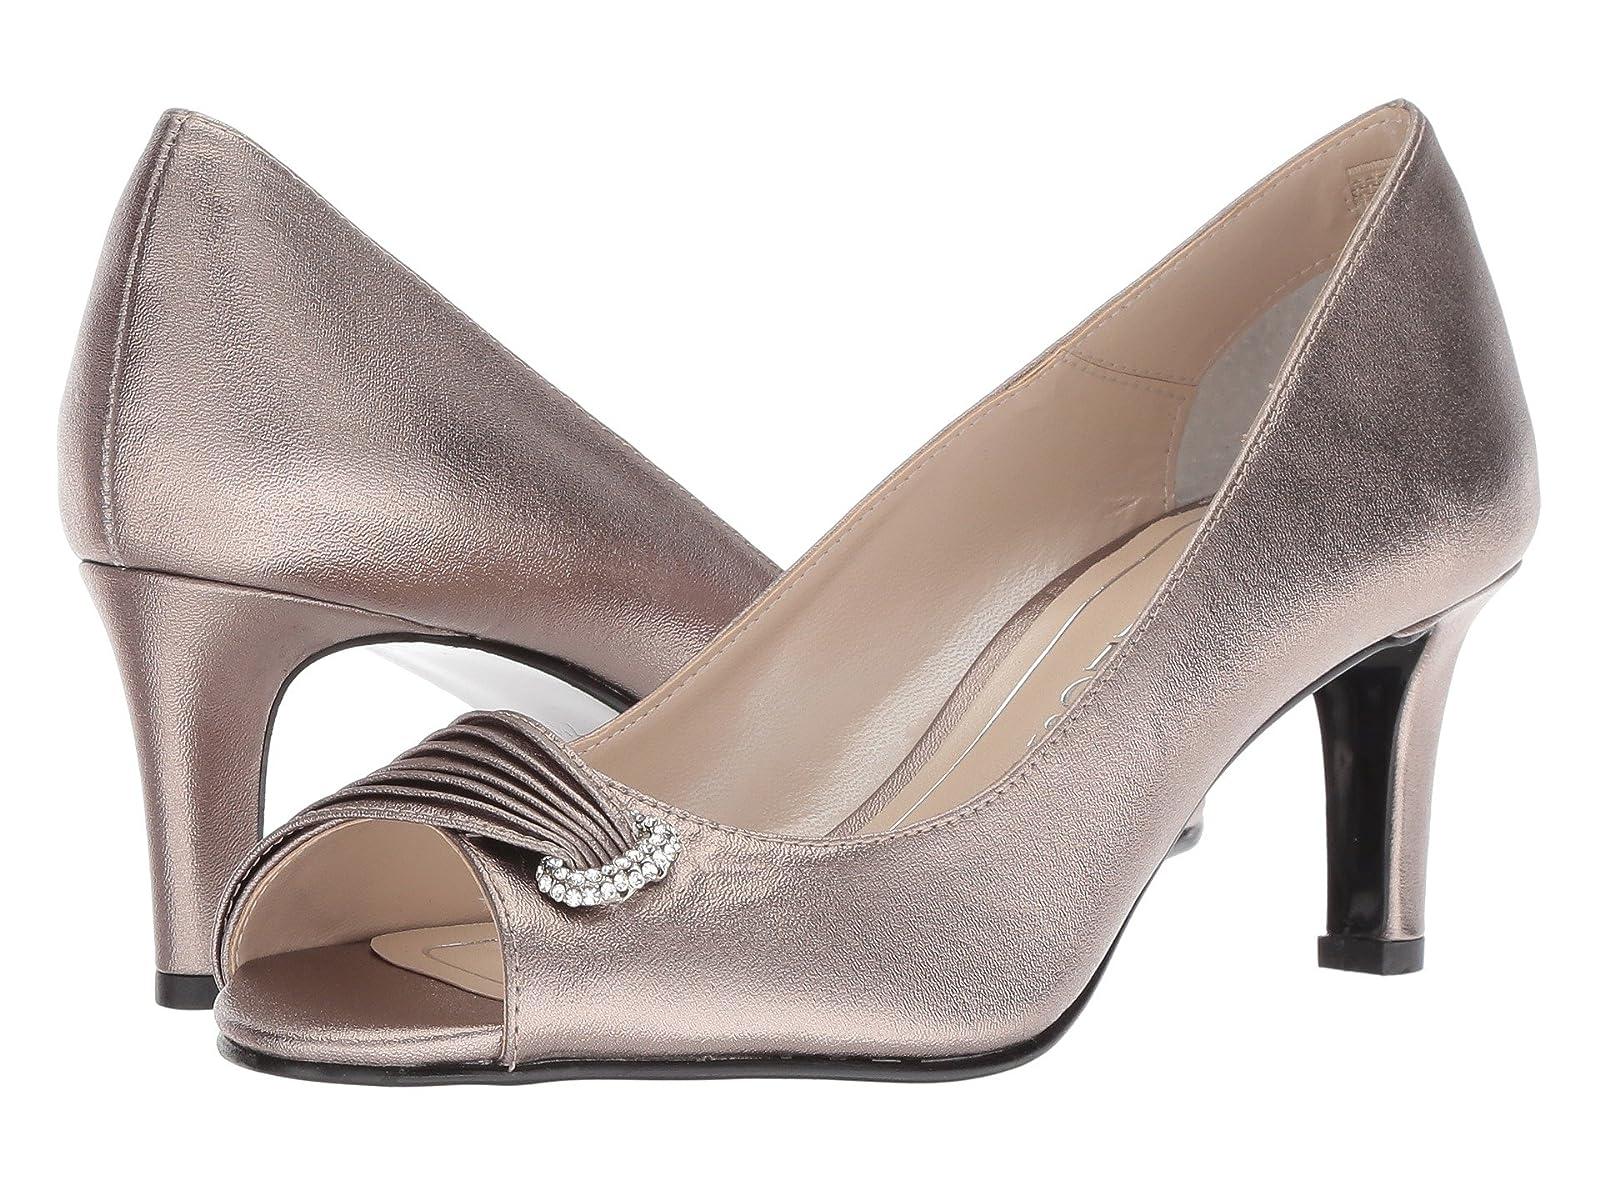 Caparros JohnAtmospheric grades have affordable shoes